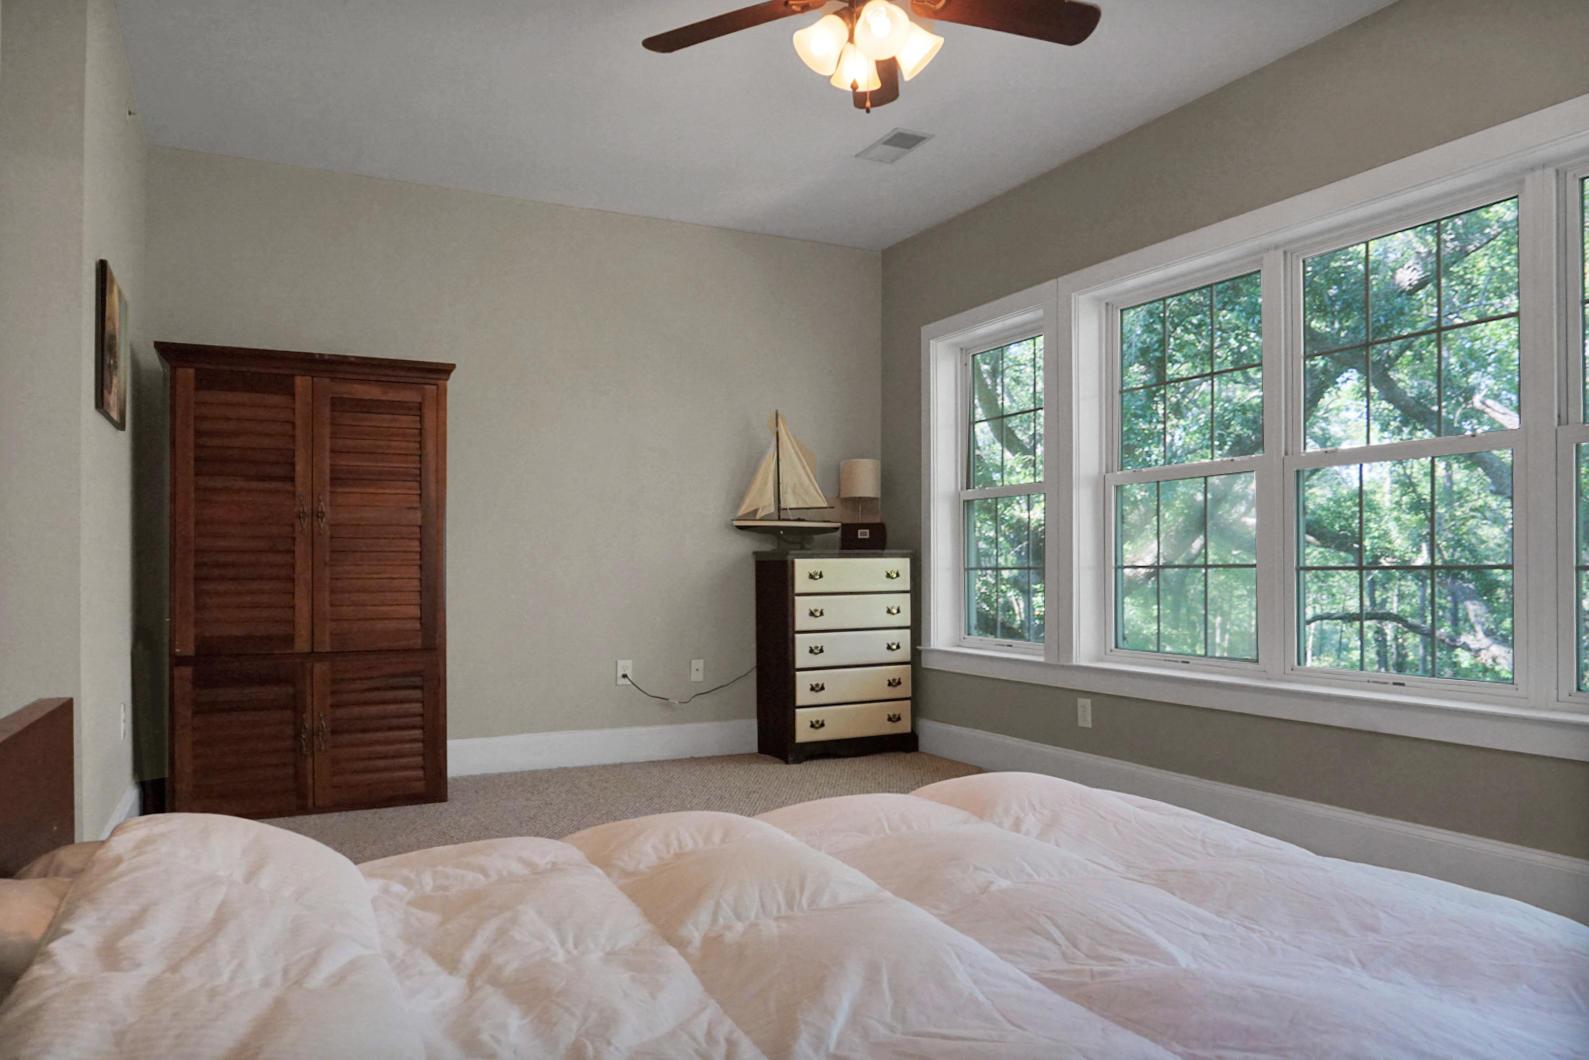 Etiwan Pointe Homes For Sale - 269 Etiwan Pointe, Mount Pleasant, SC - 25